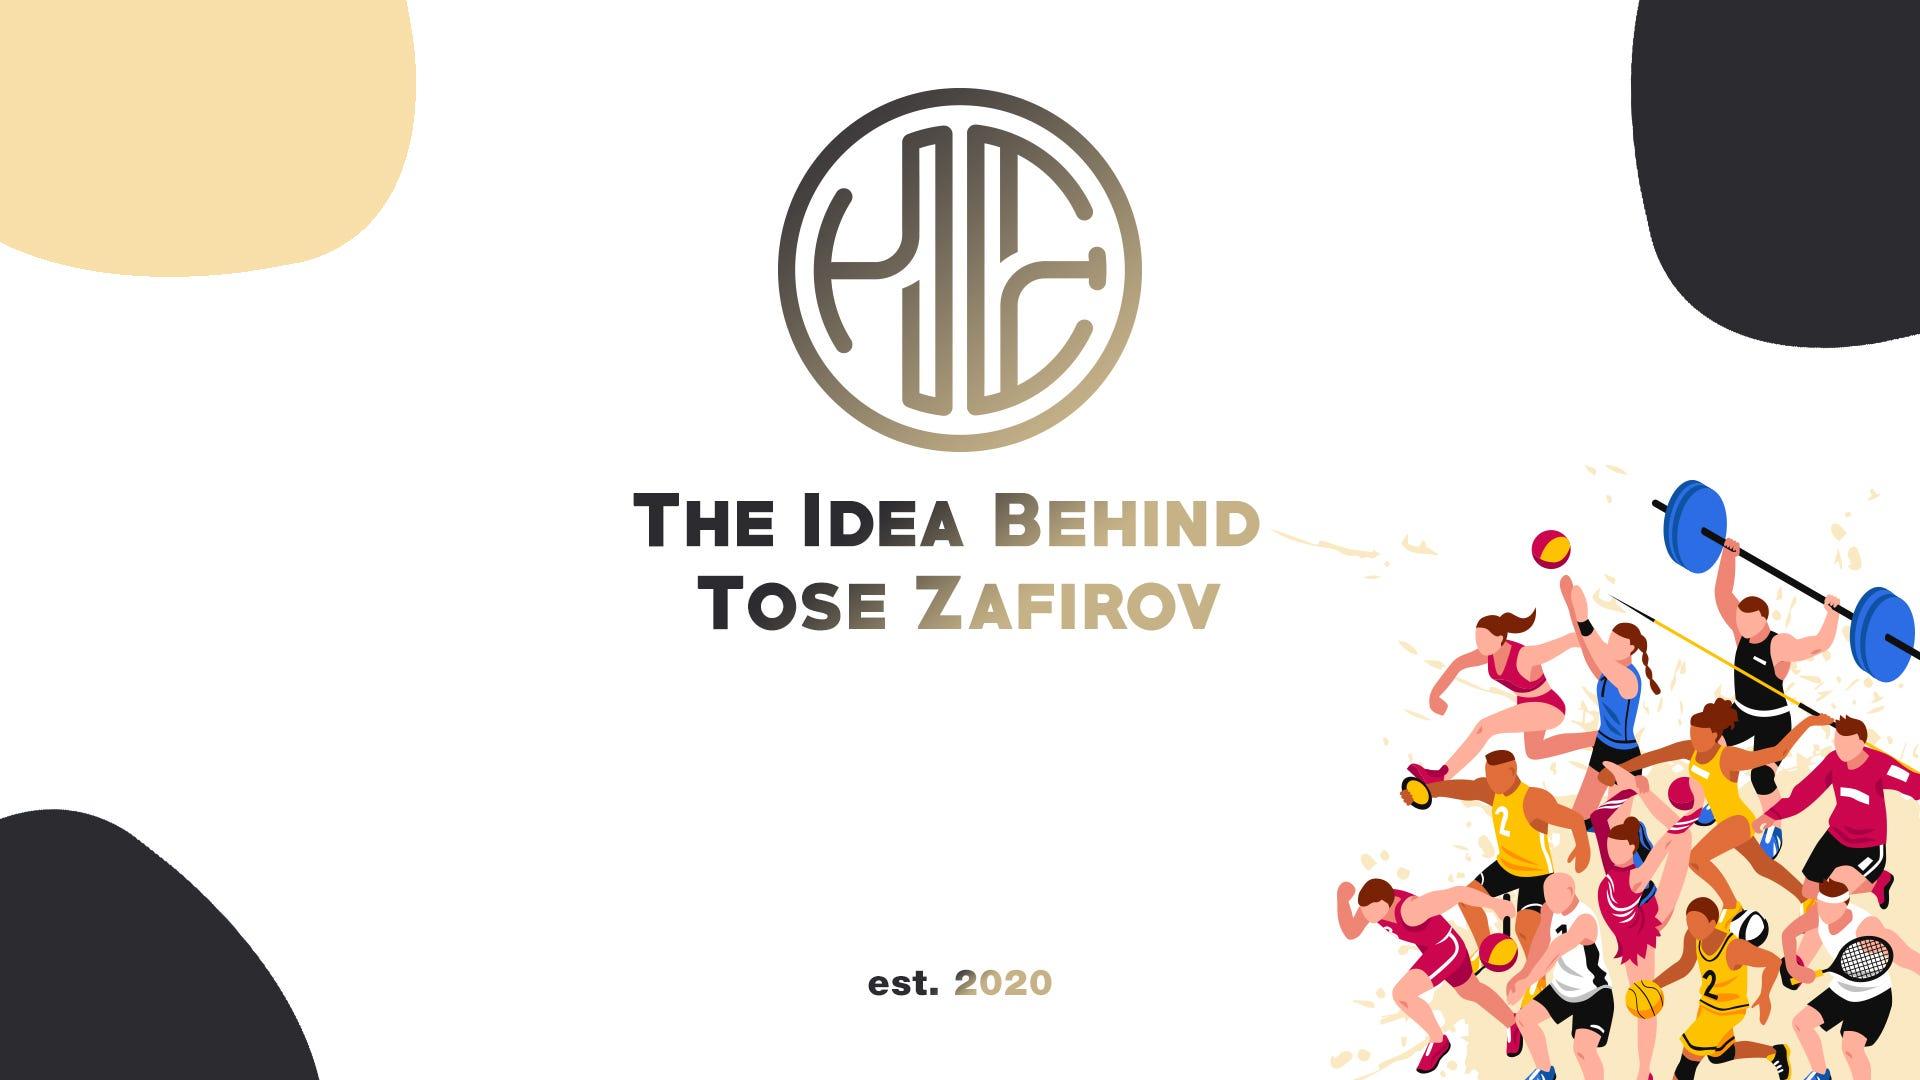 The Idea Behind Tose Zafirov